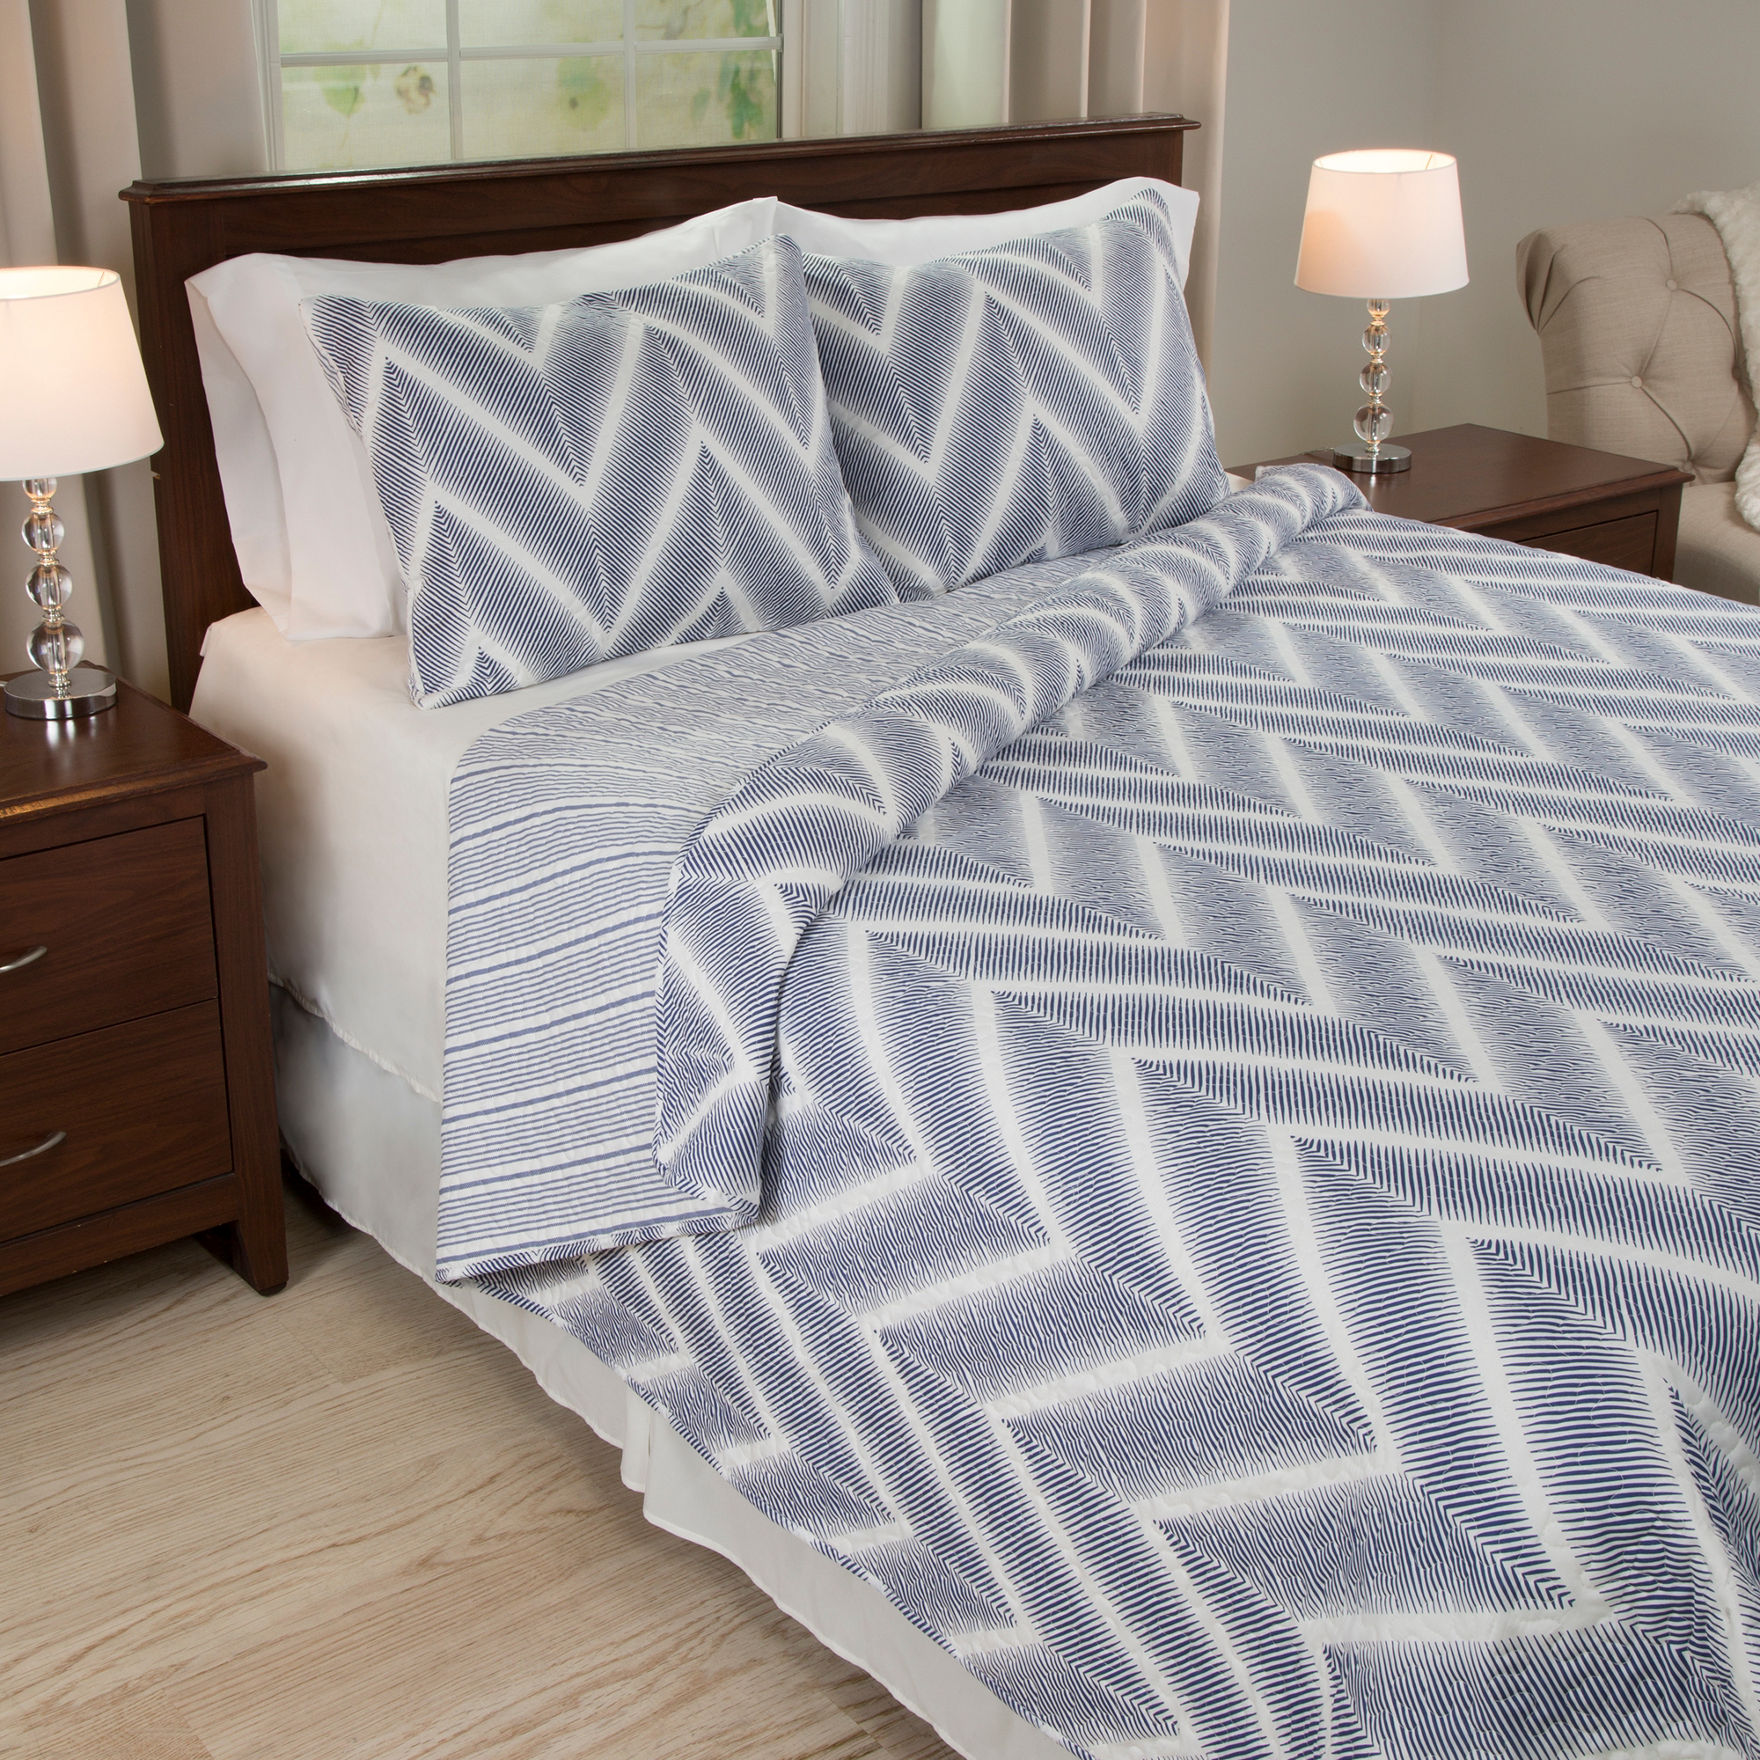 Lavish Home Navy / White Quilts & Quilt Sets